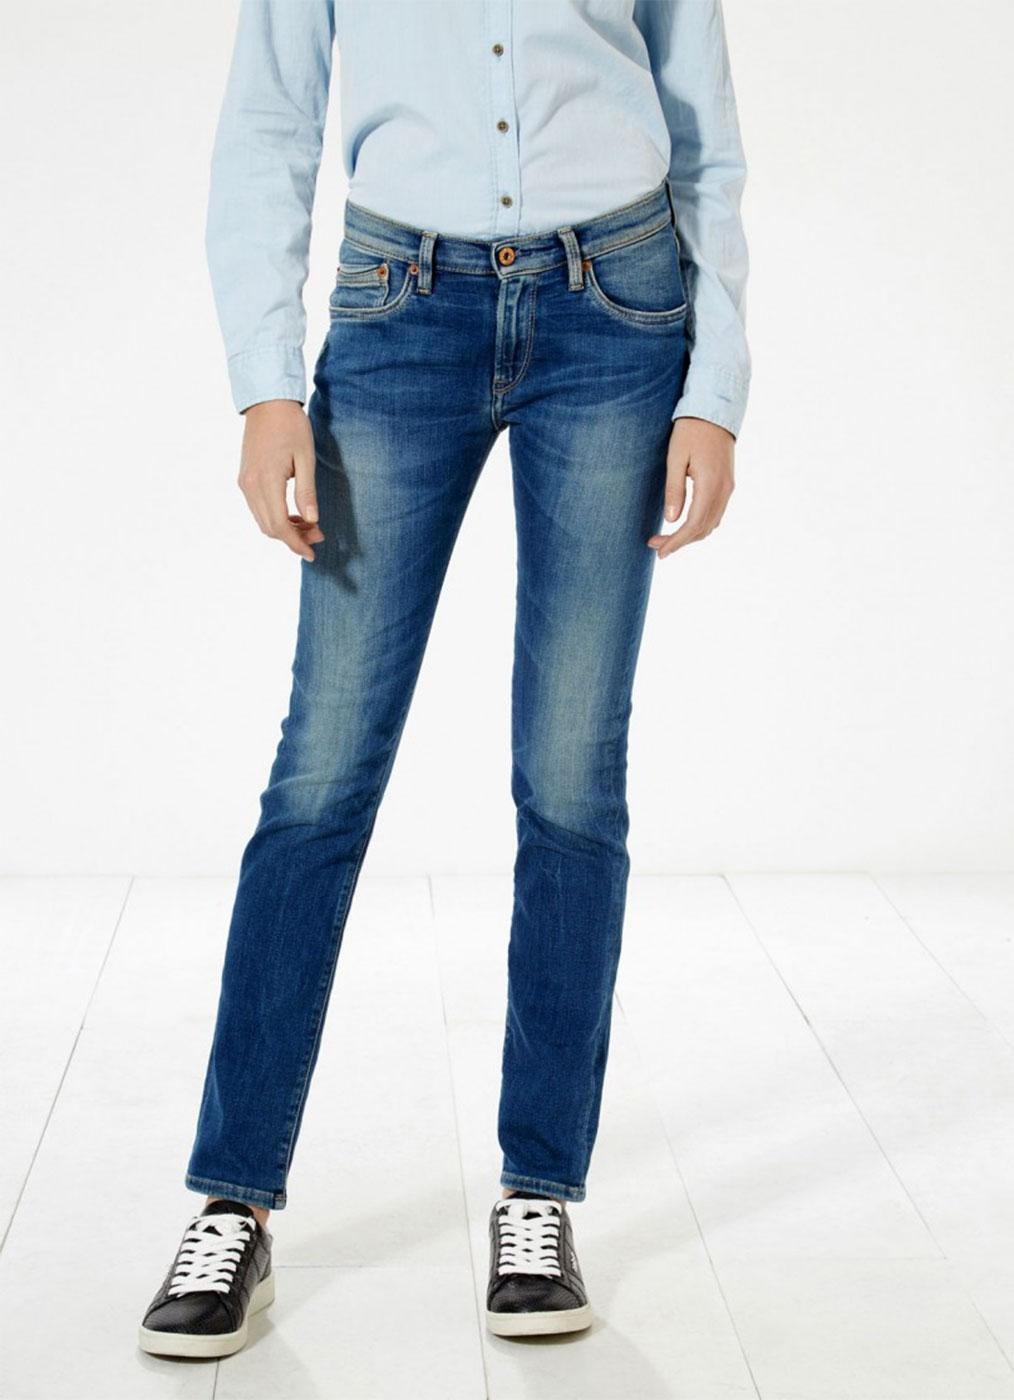 Victoria PEPE JEANS High Waist Slim Leg Jeans E62